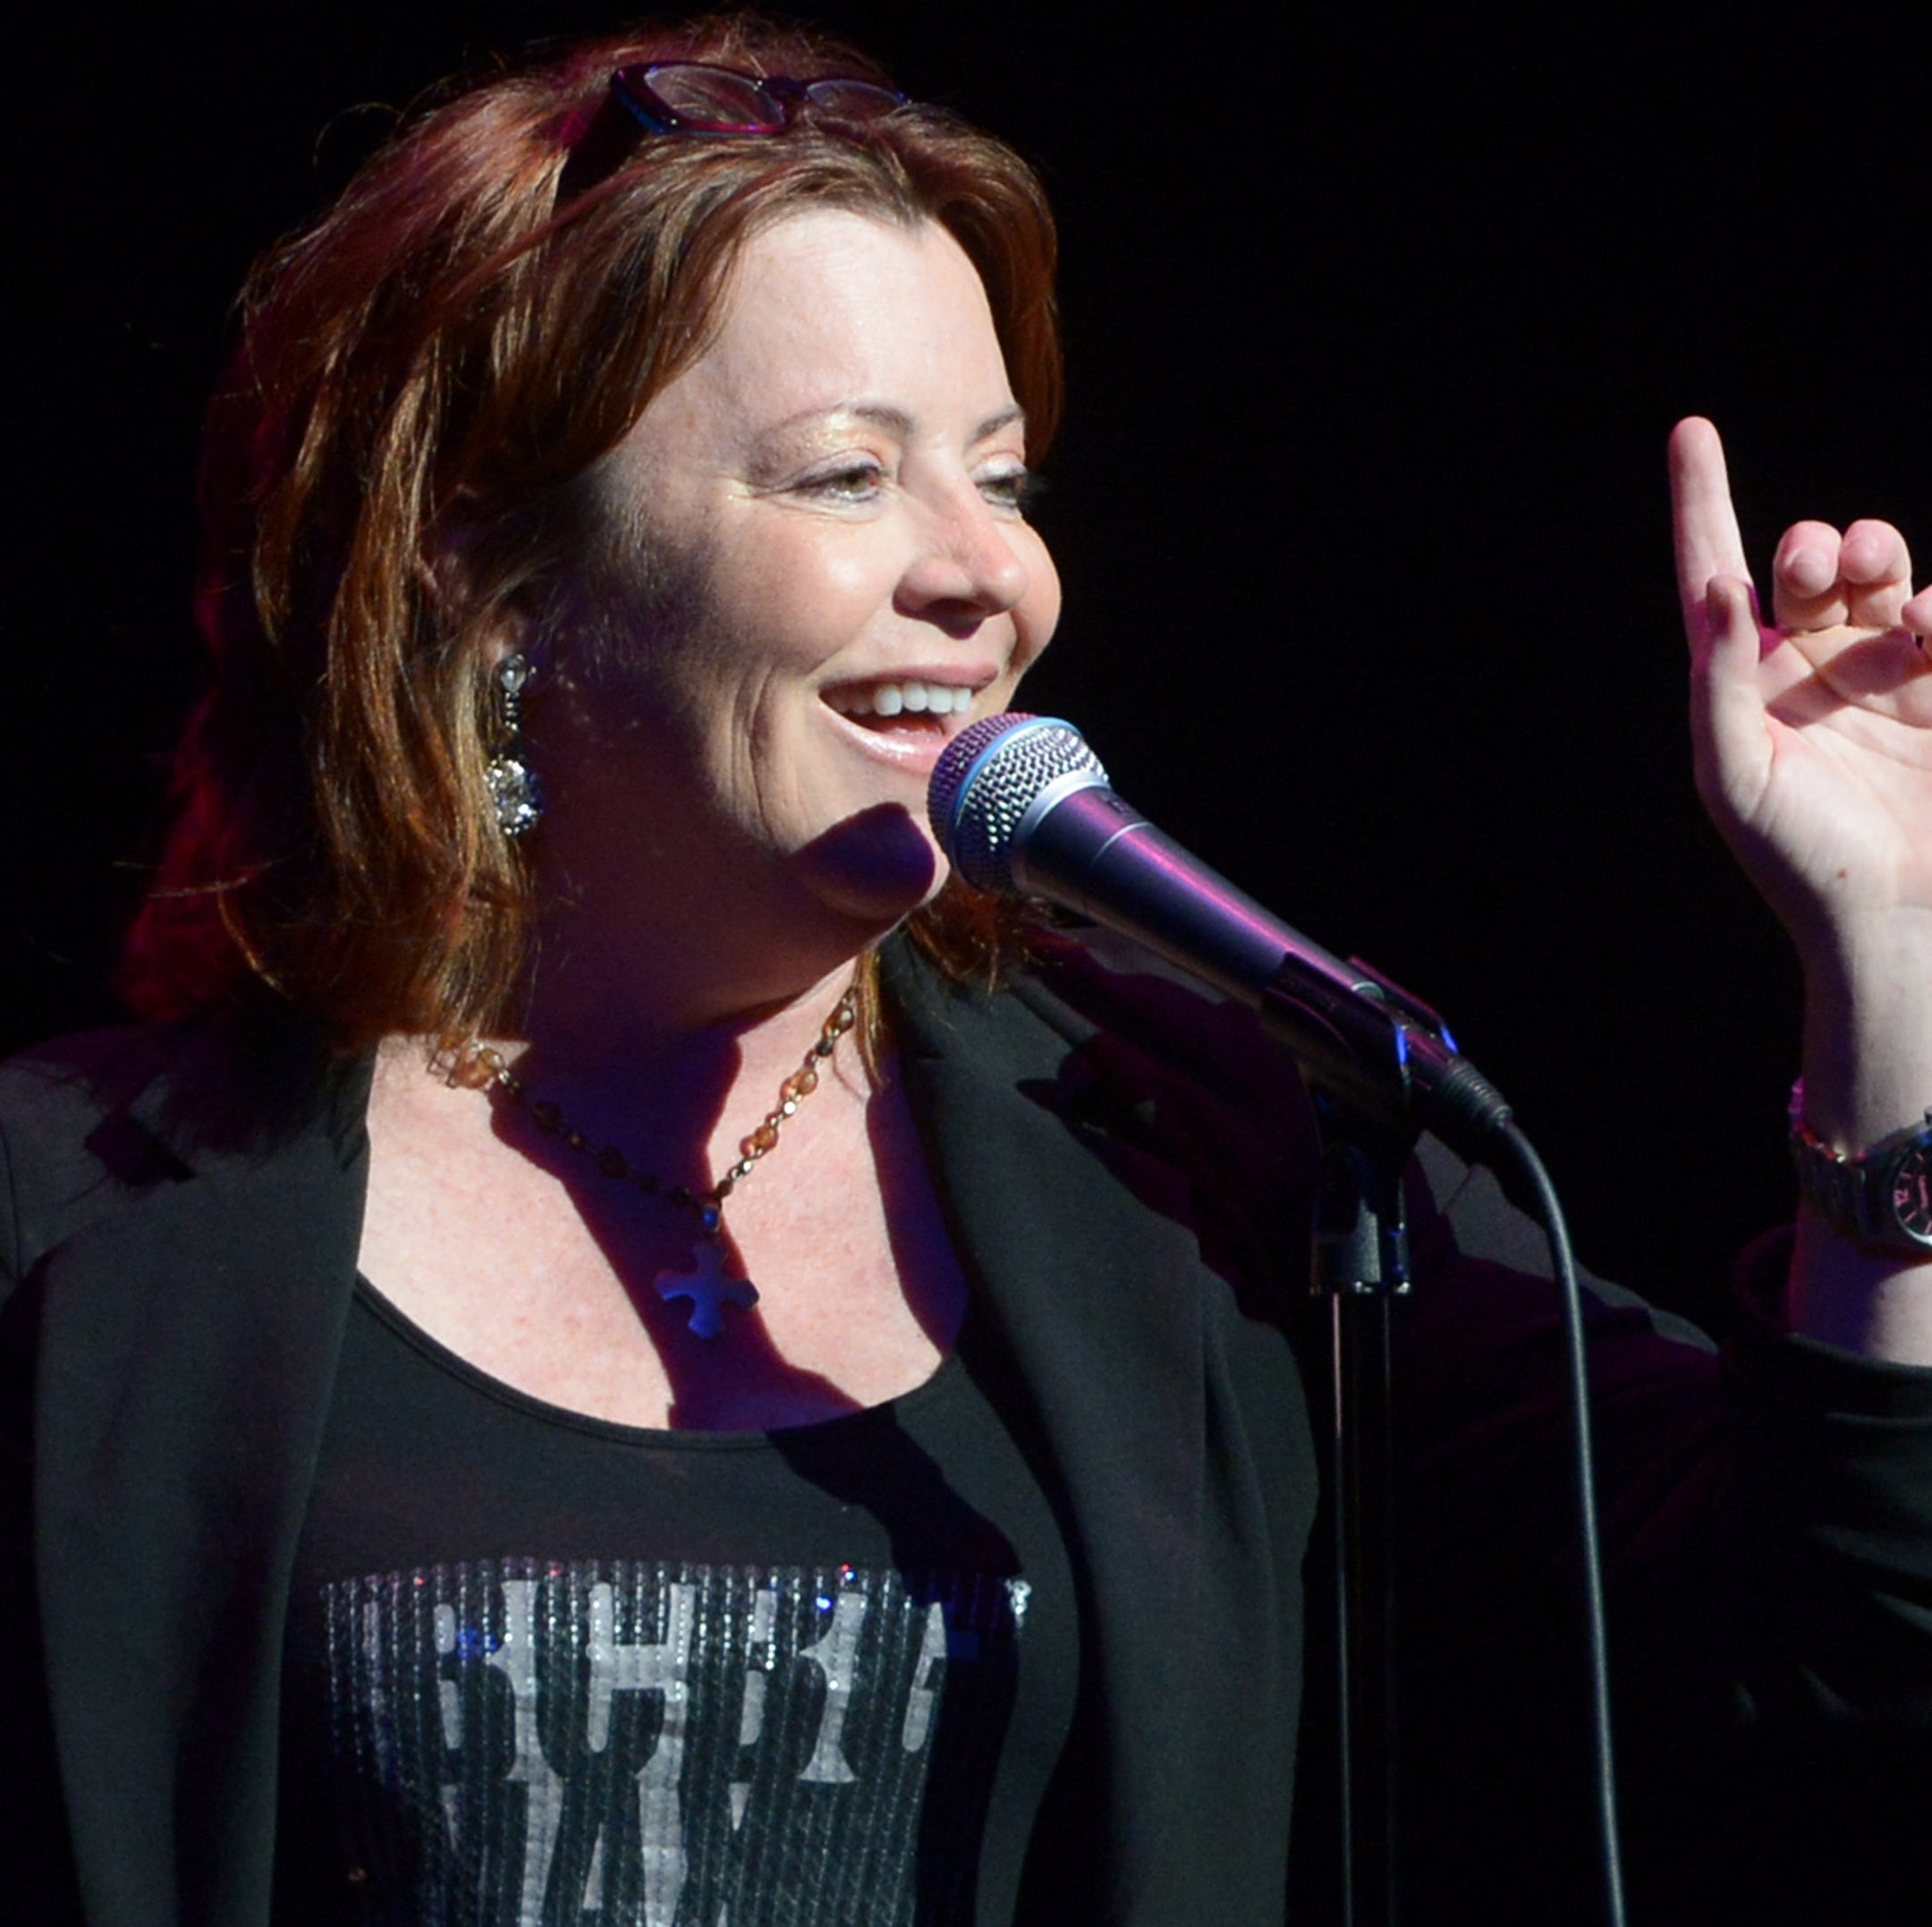 Comedian Kathleen Madigan: 'Me and Lewis Black ... we've been so drunk at Cleo's'